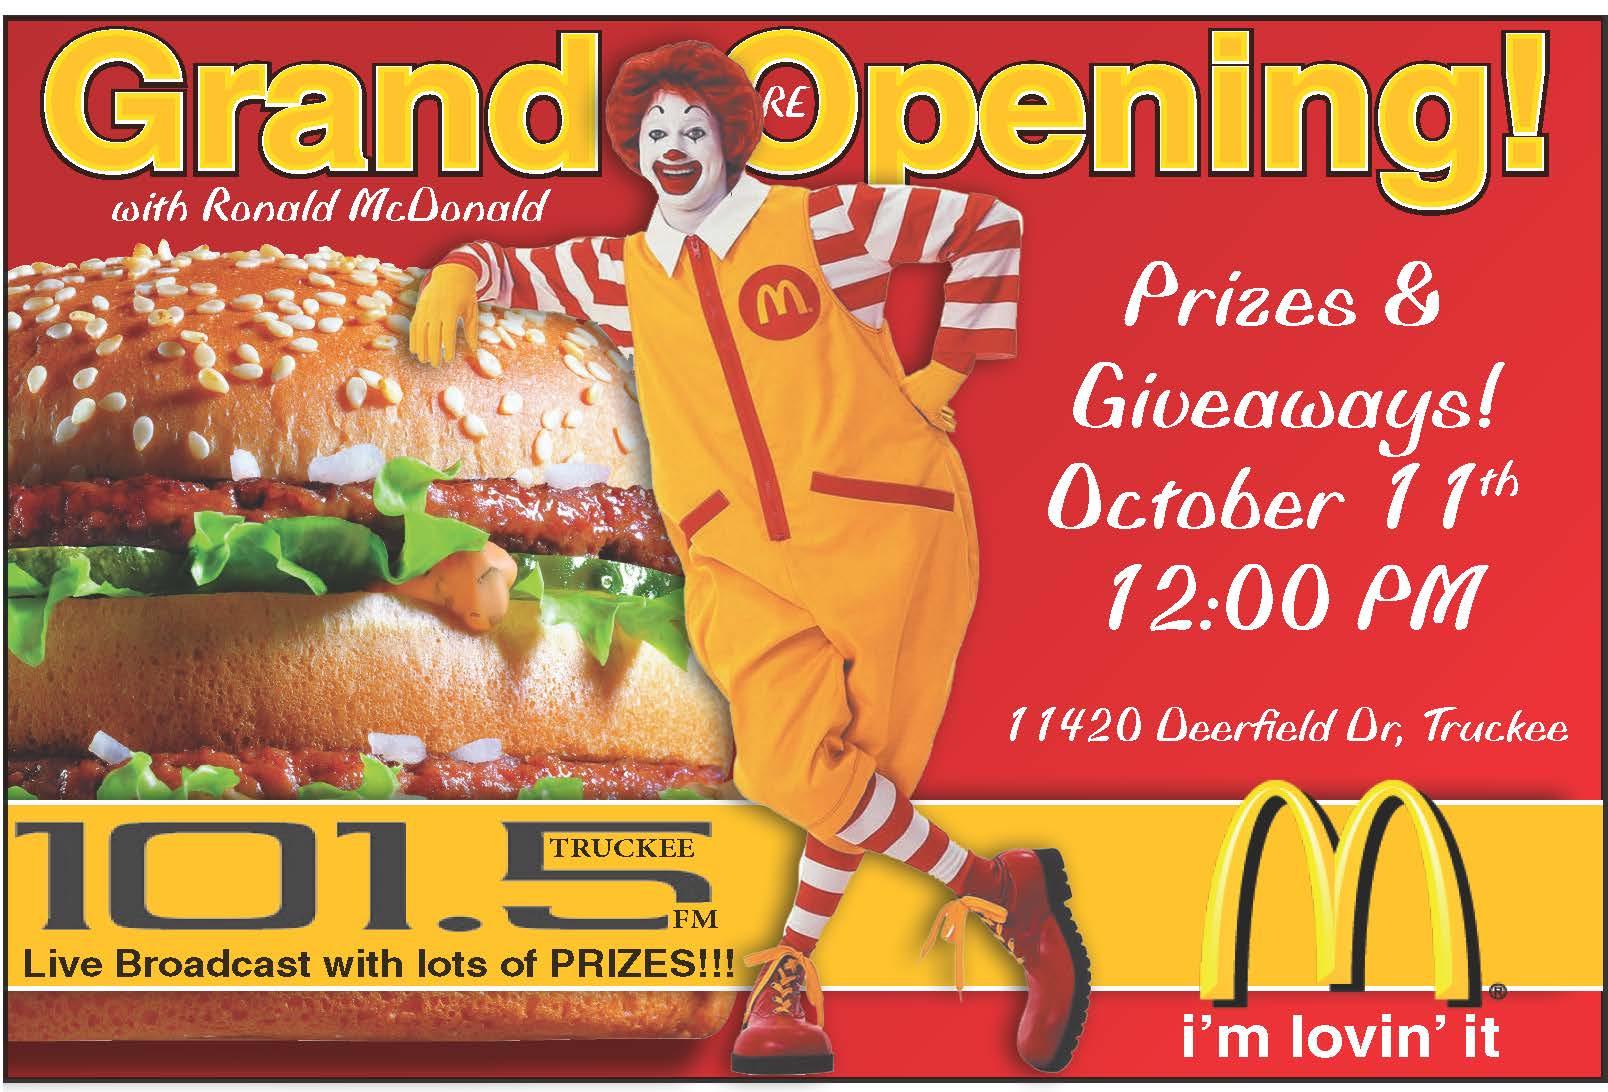 McDonalds Truckee